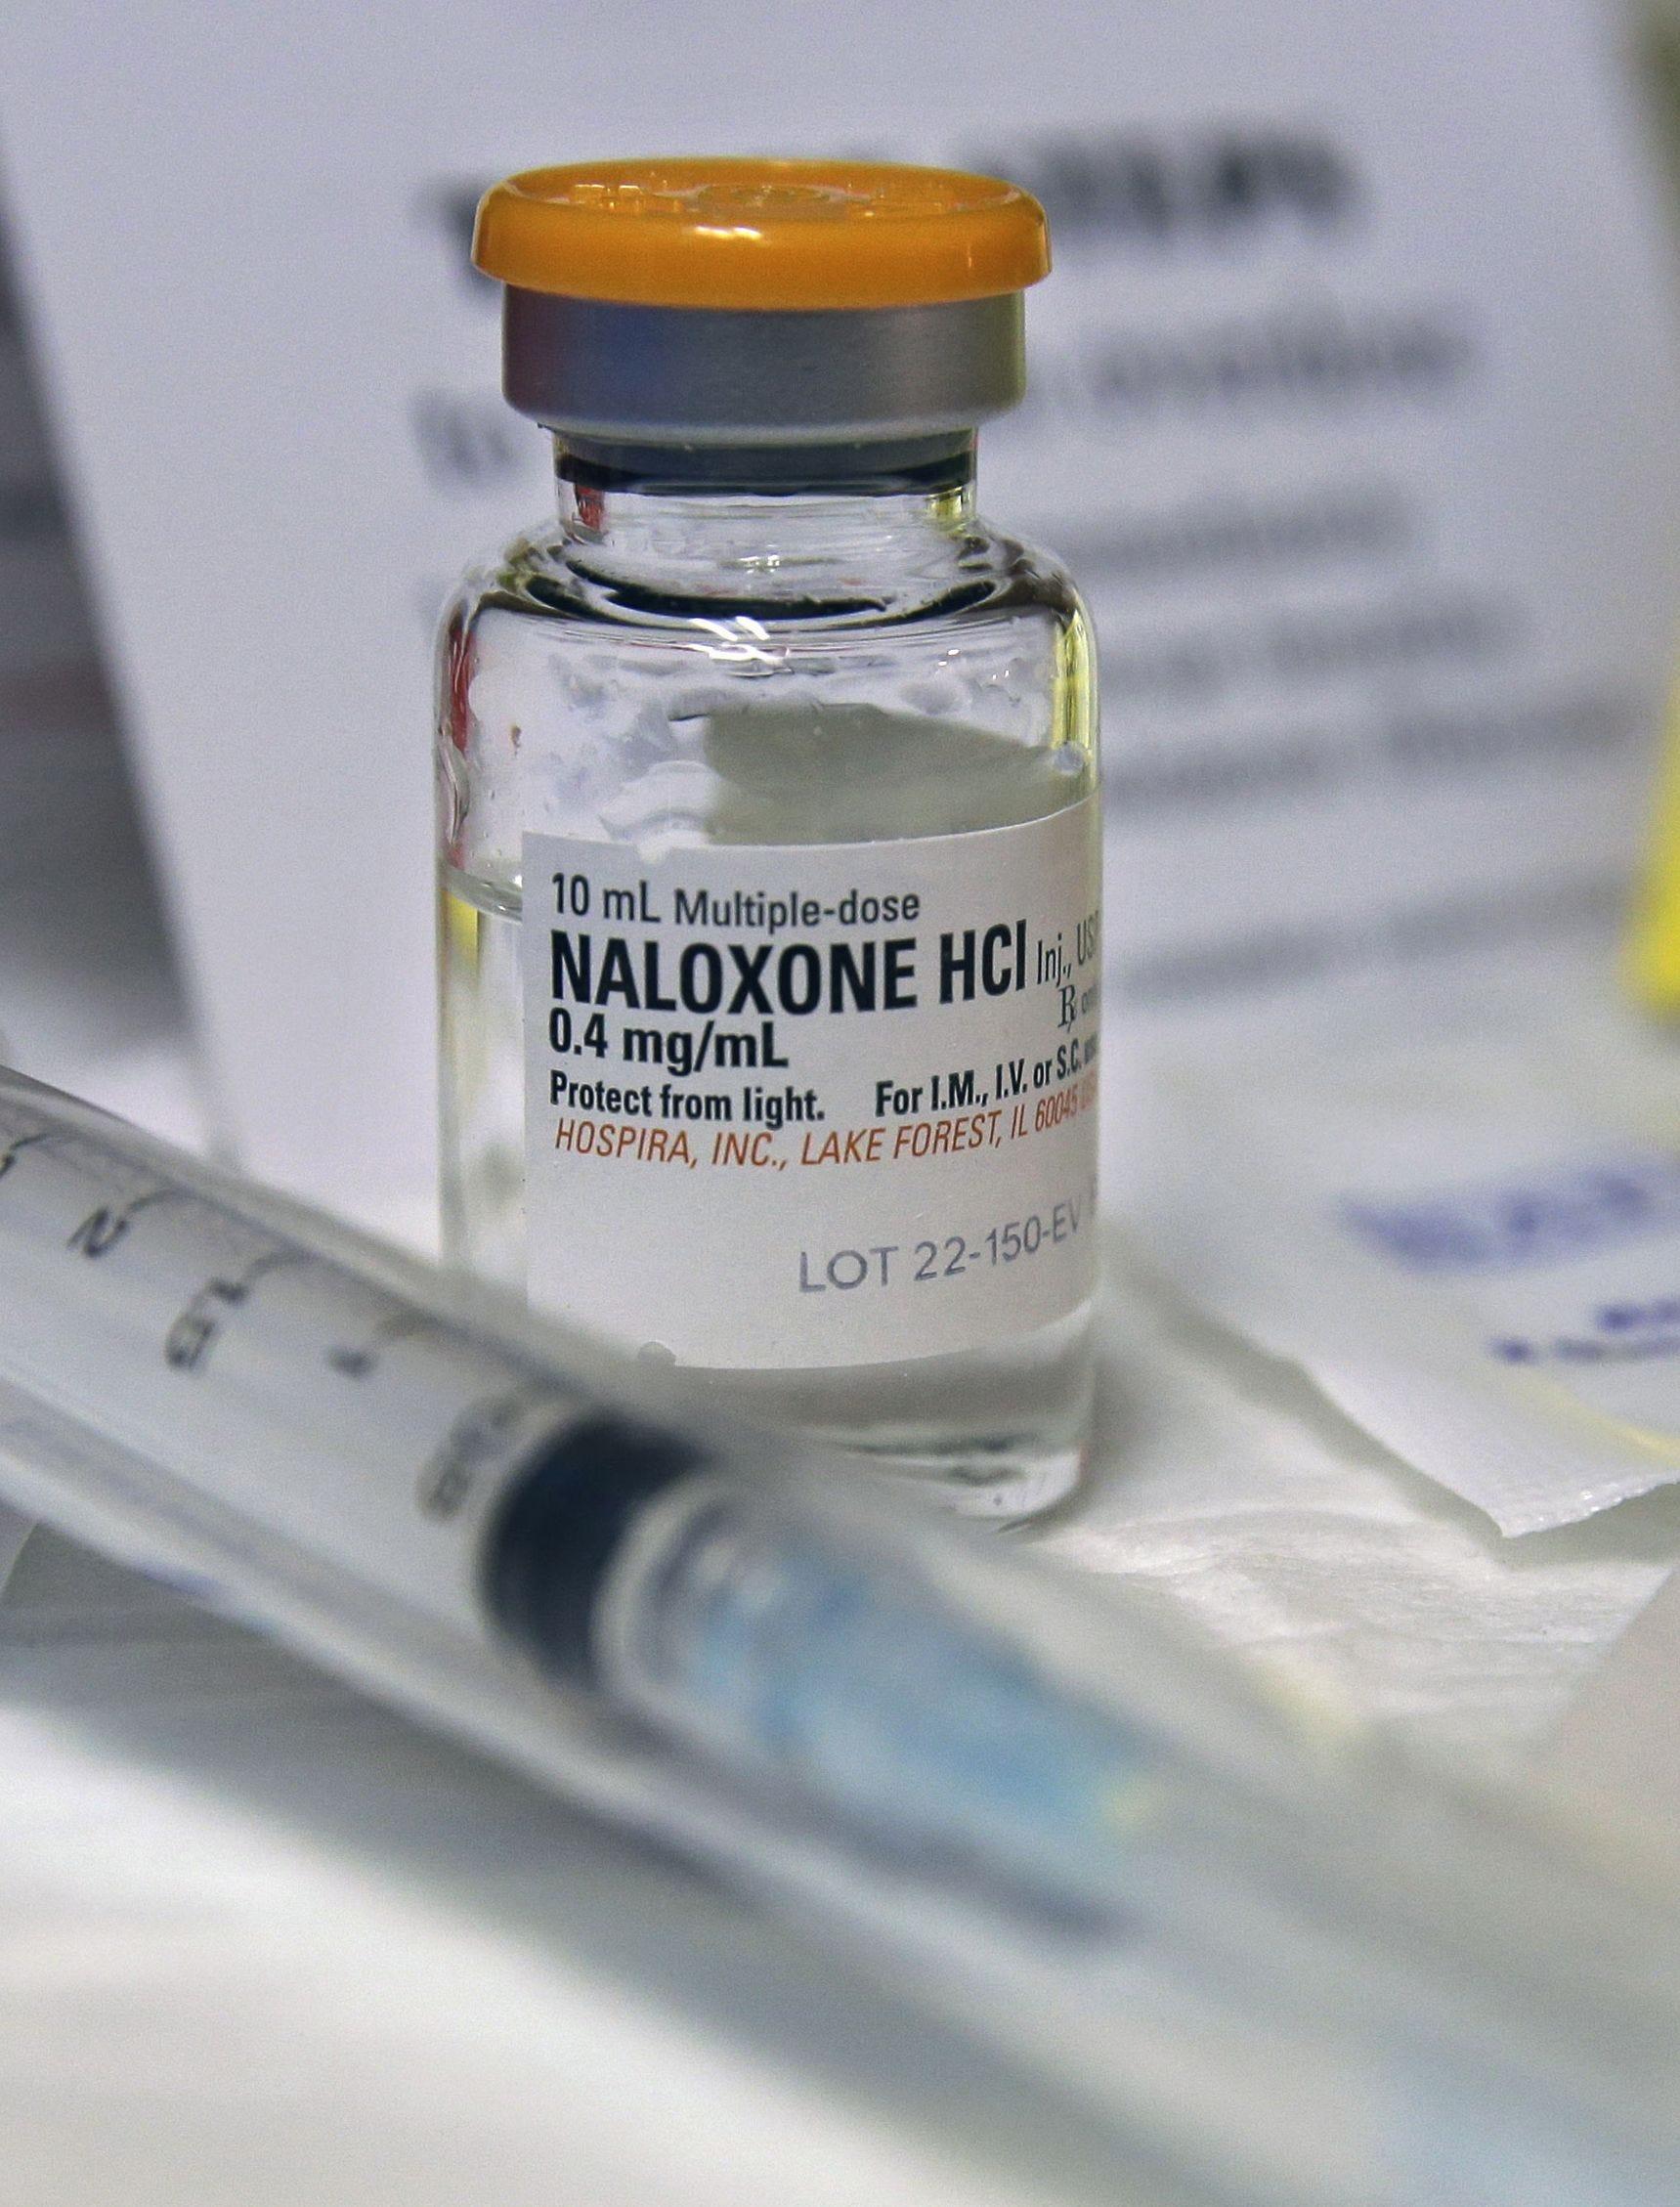 Ohio councilman suggests three-strikes law to halt overdose rescues